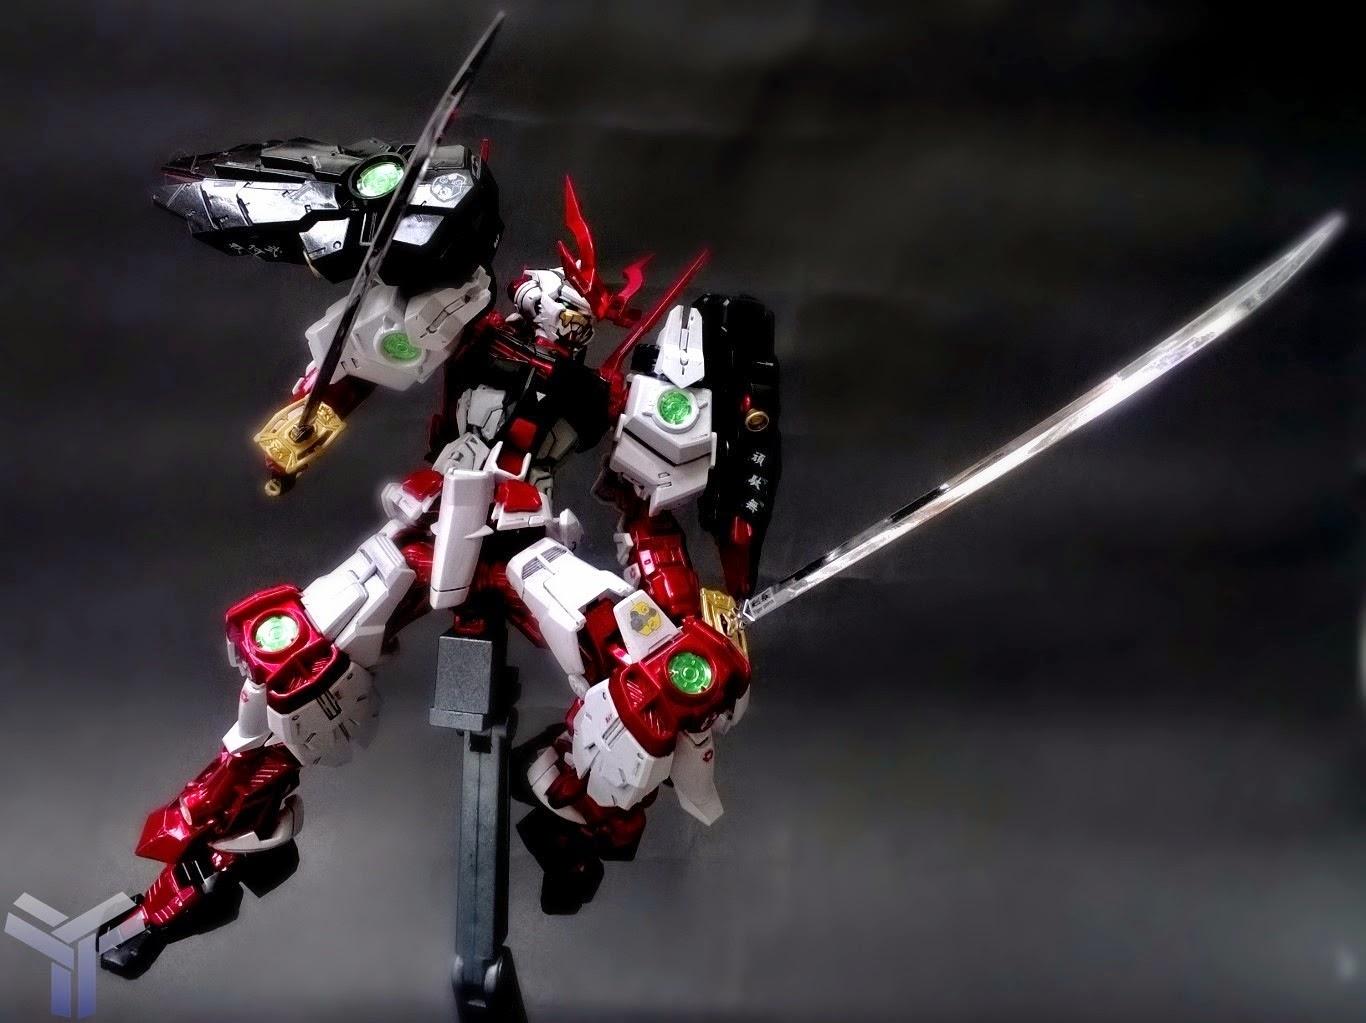 MG Sengoku Astray Painted Build - Gundam Kits Collection News and